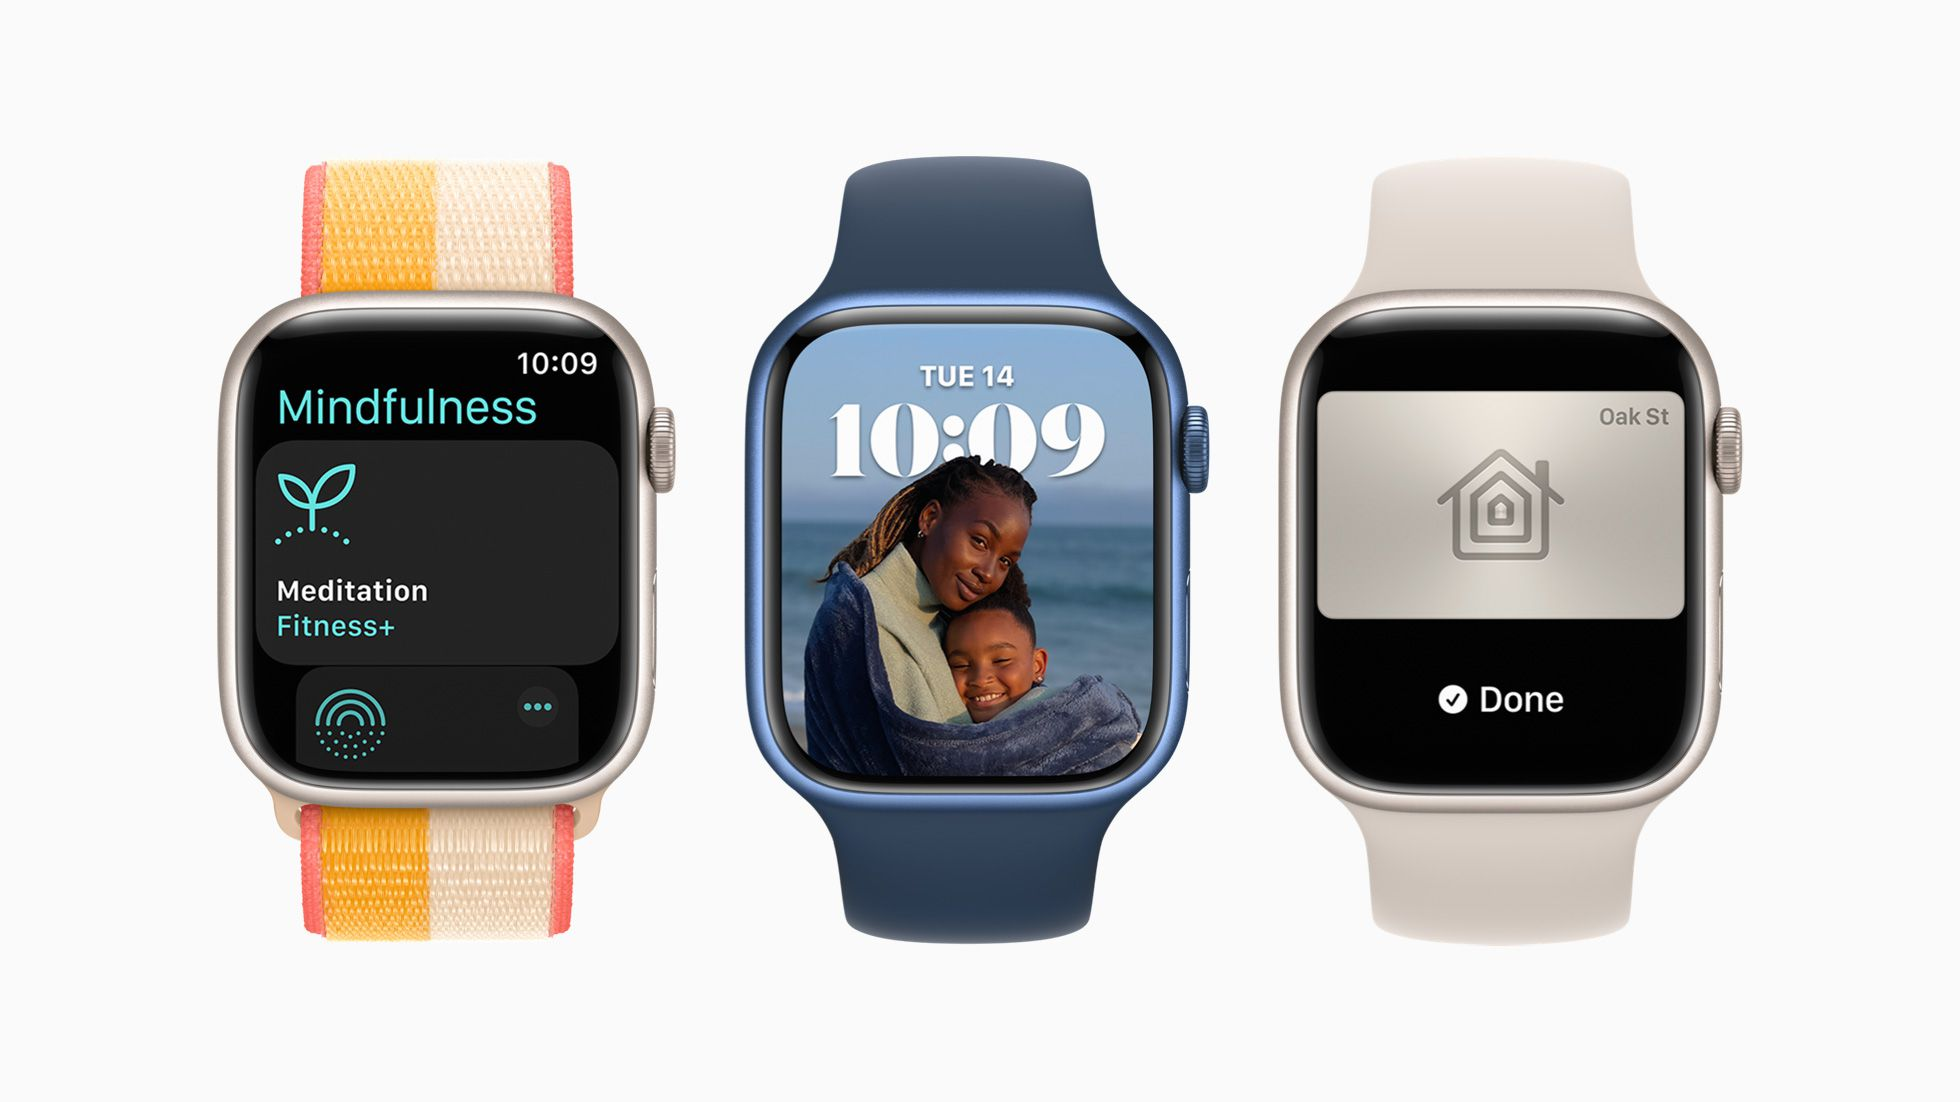 Apple watchOS 8 update